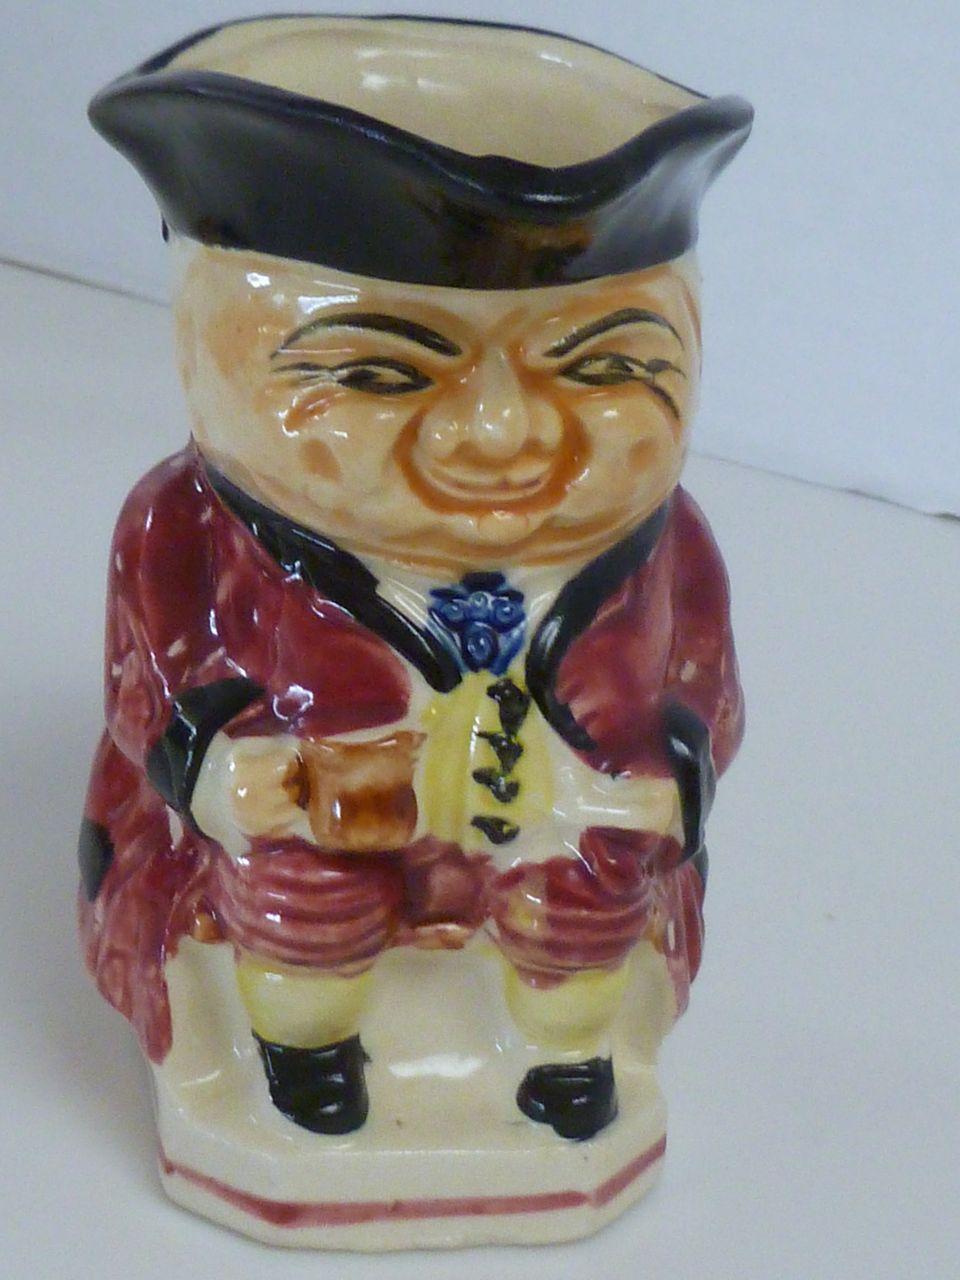 Vintage Ceramic Toby Character Creamer Pitcher Japan